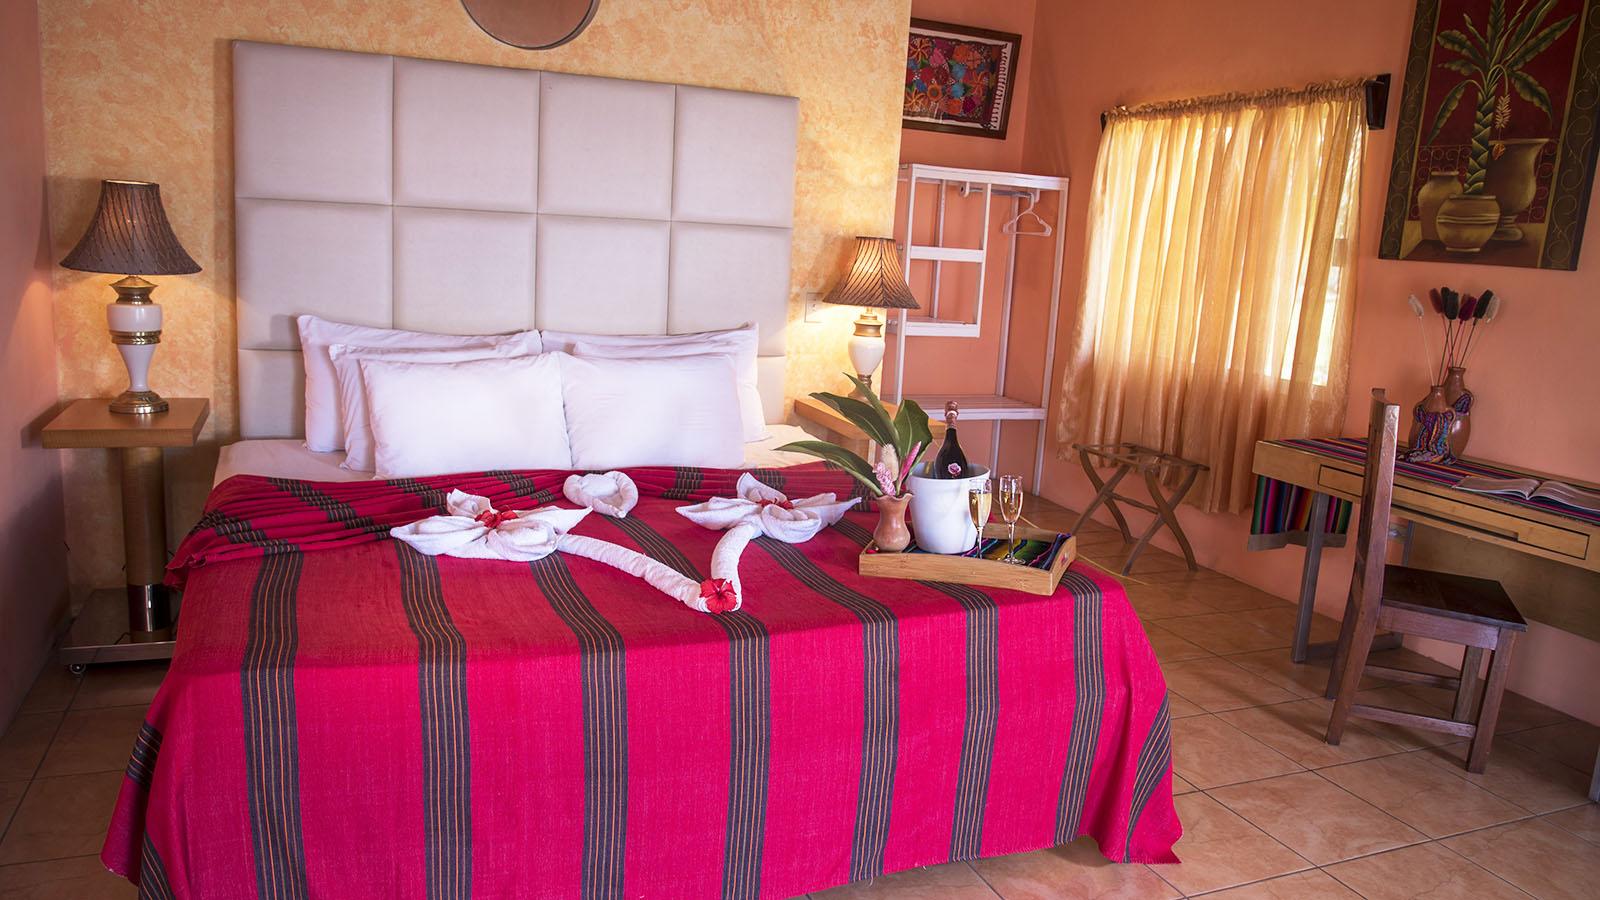 Belize Accommodations Honeymoon Cabanas Cahal Pech Village Resort